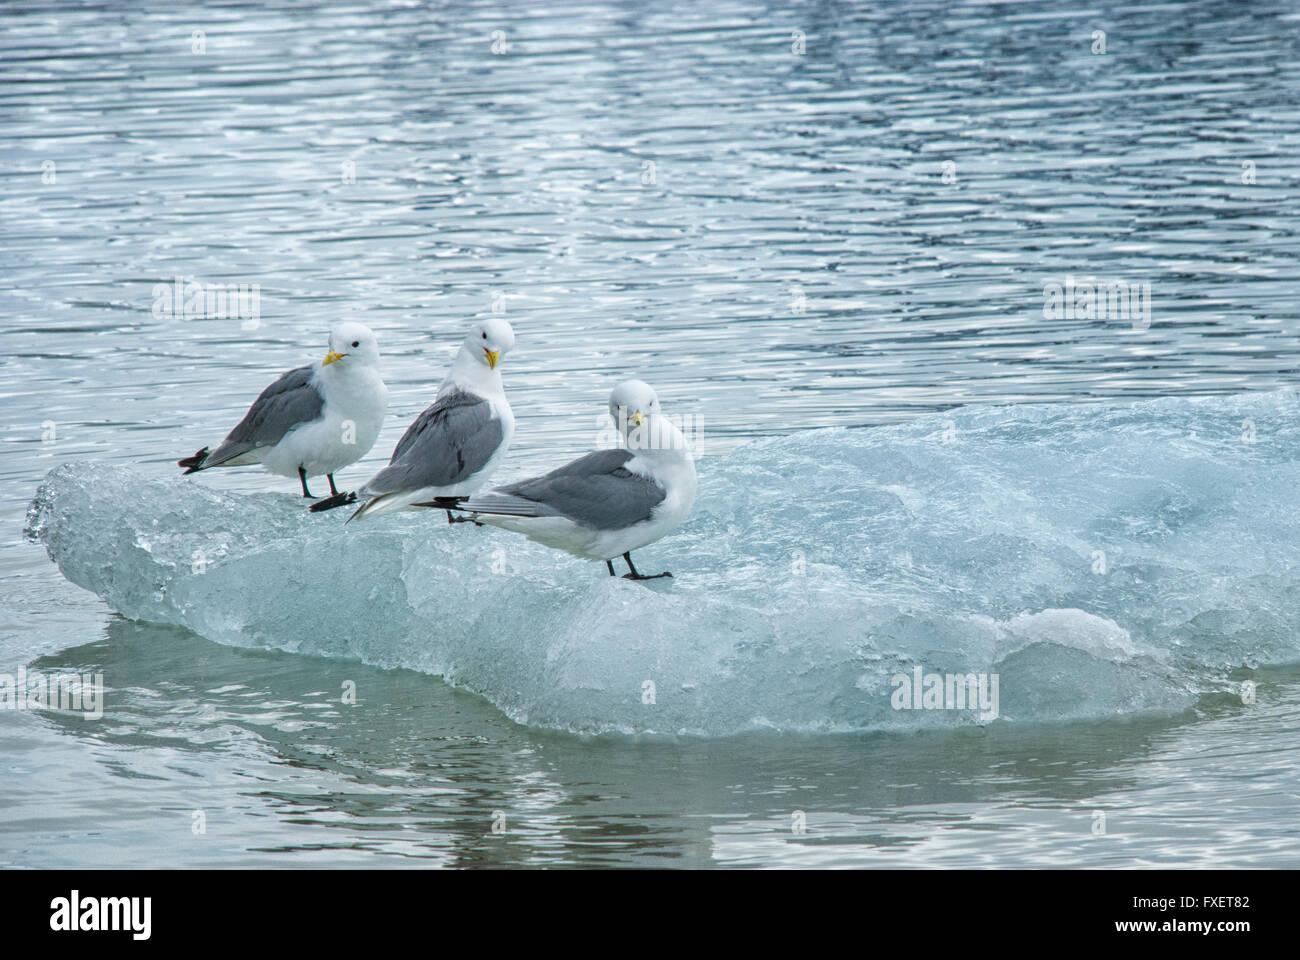 Three Glaucous Gulls, Larus hyperboreus, perched on an iceberg in Spitsbergen, Svalbard Archipelago, Norway Stock Photo